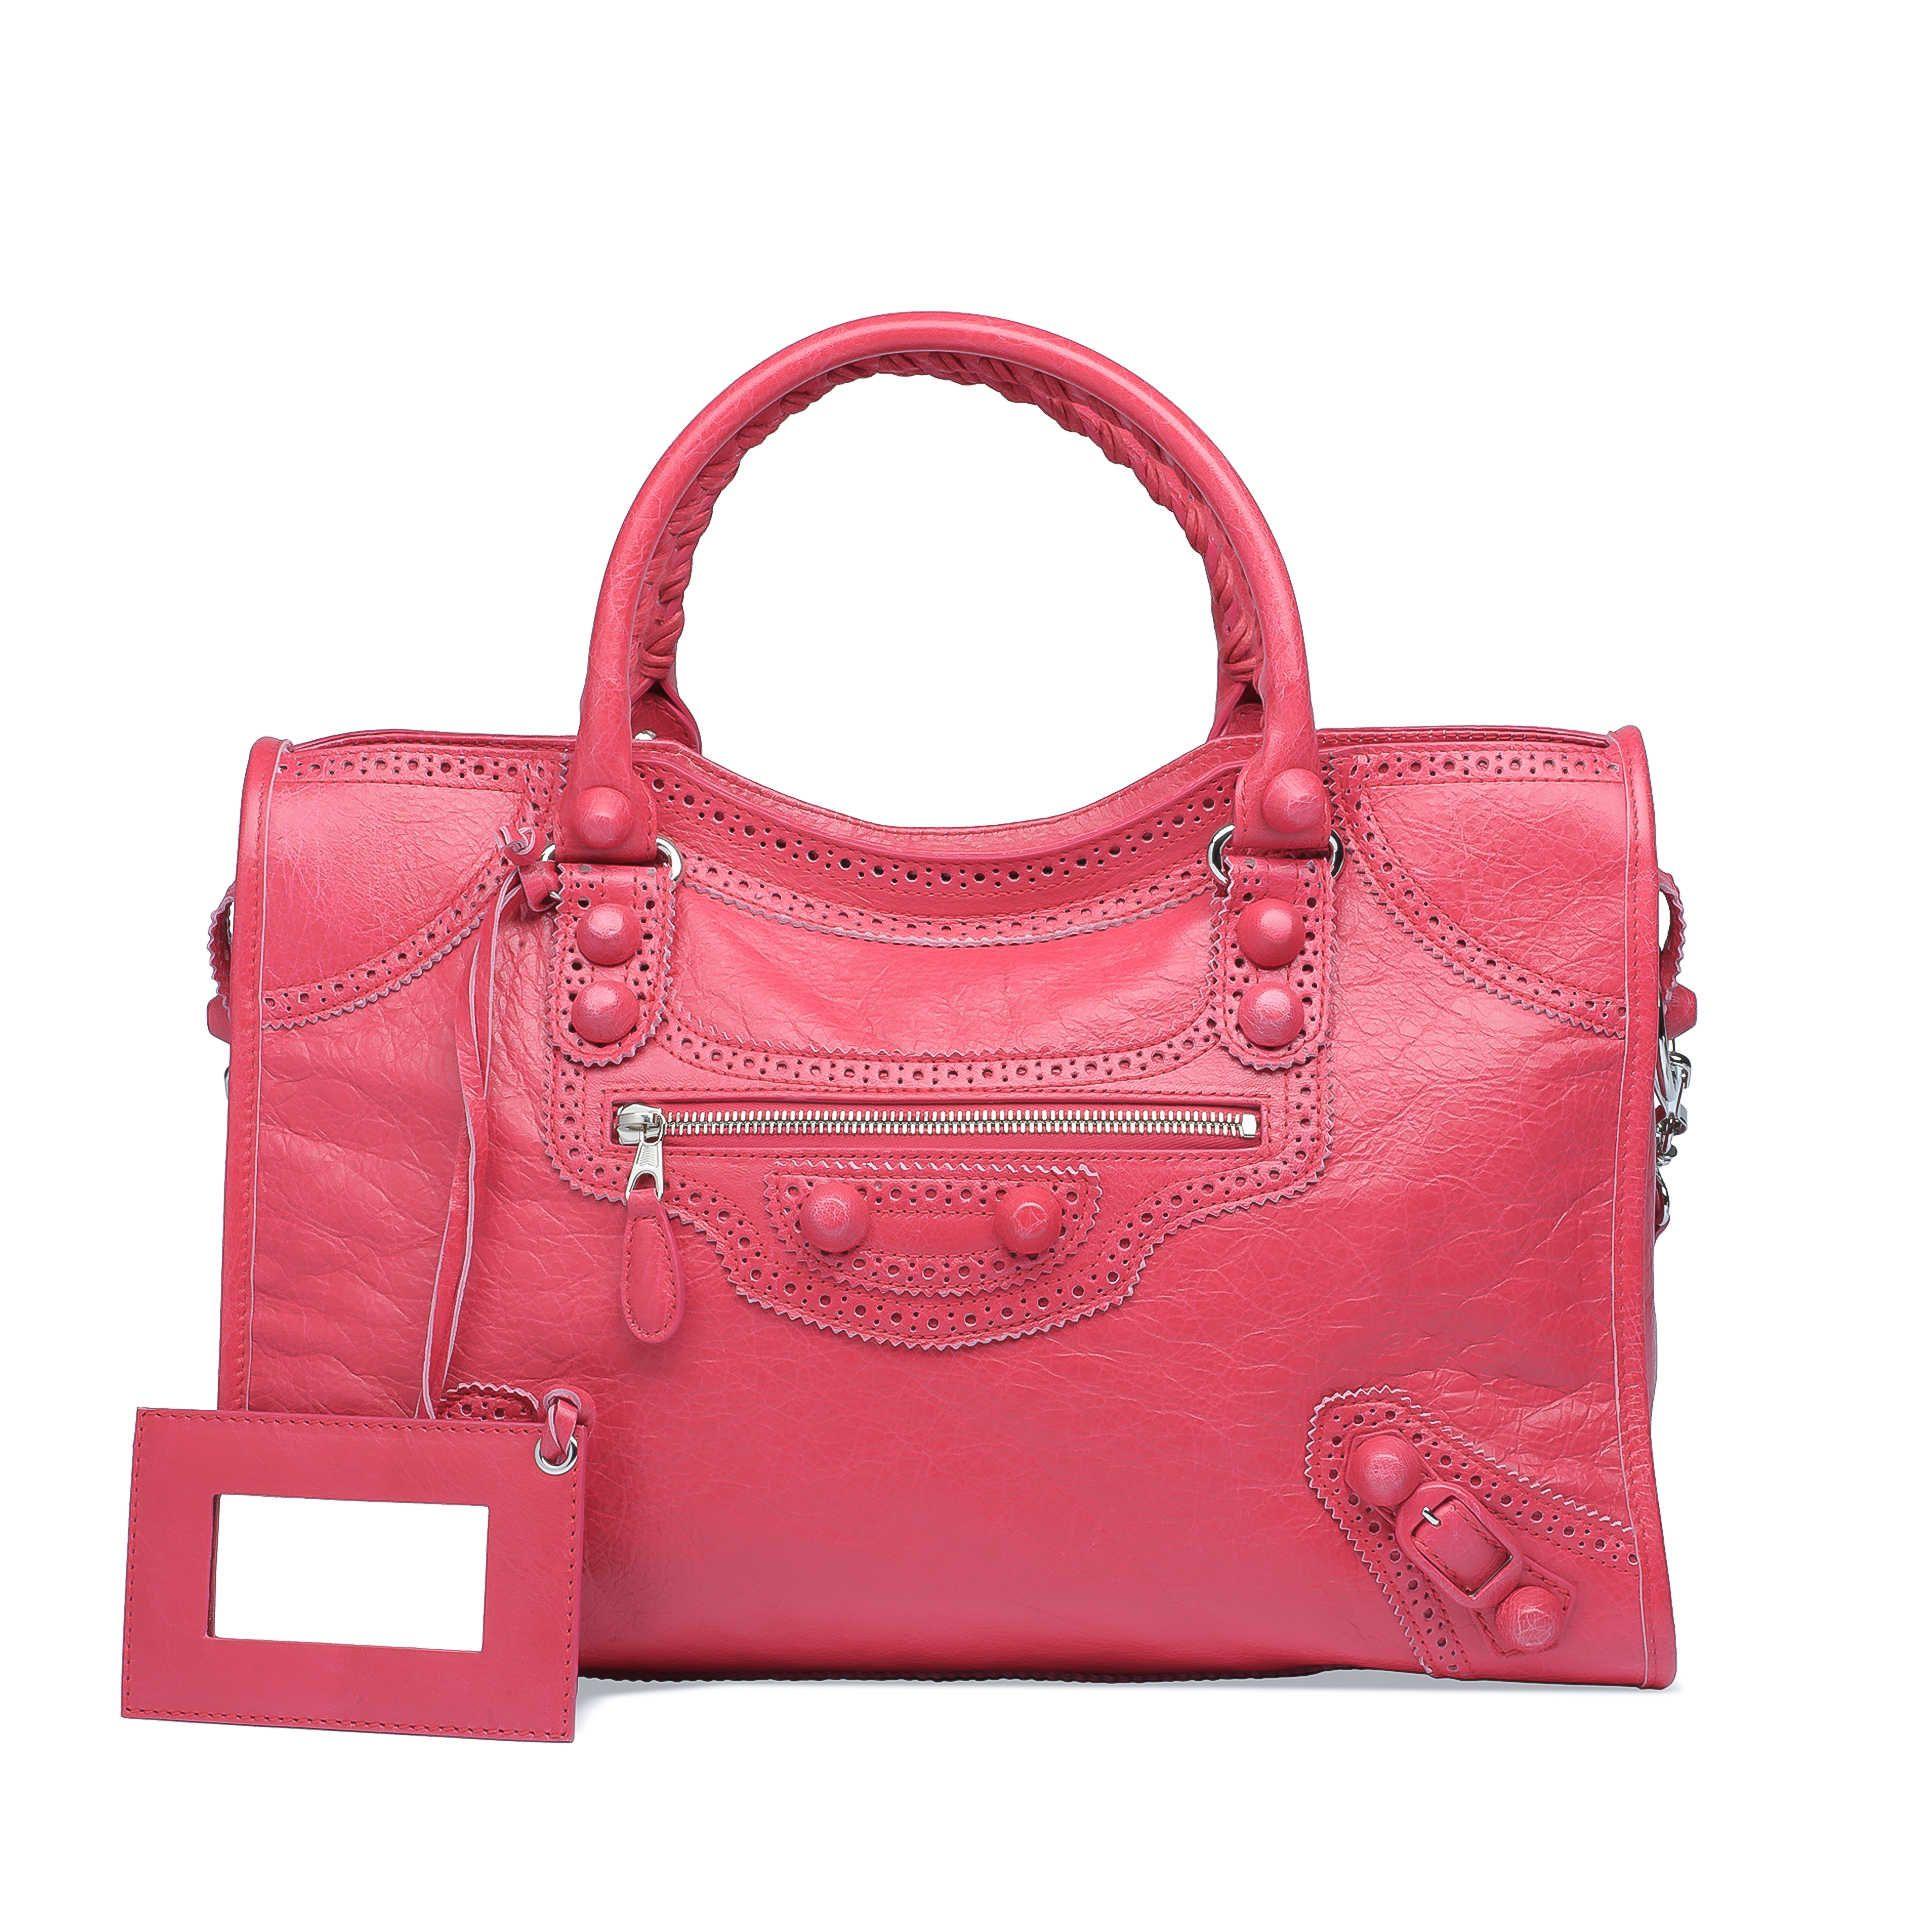 ca53449207 Cassis Balenciaga Giant City Brogues - Handbags's Brogues - Balenciaga